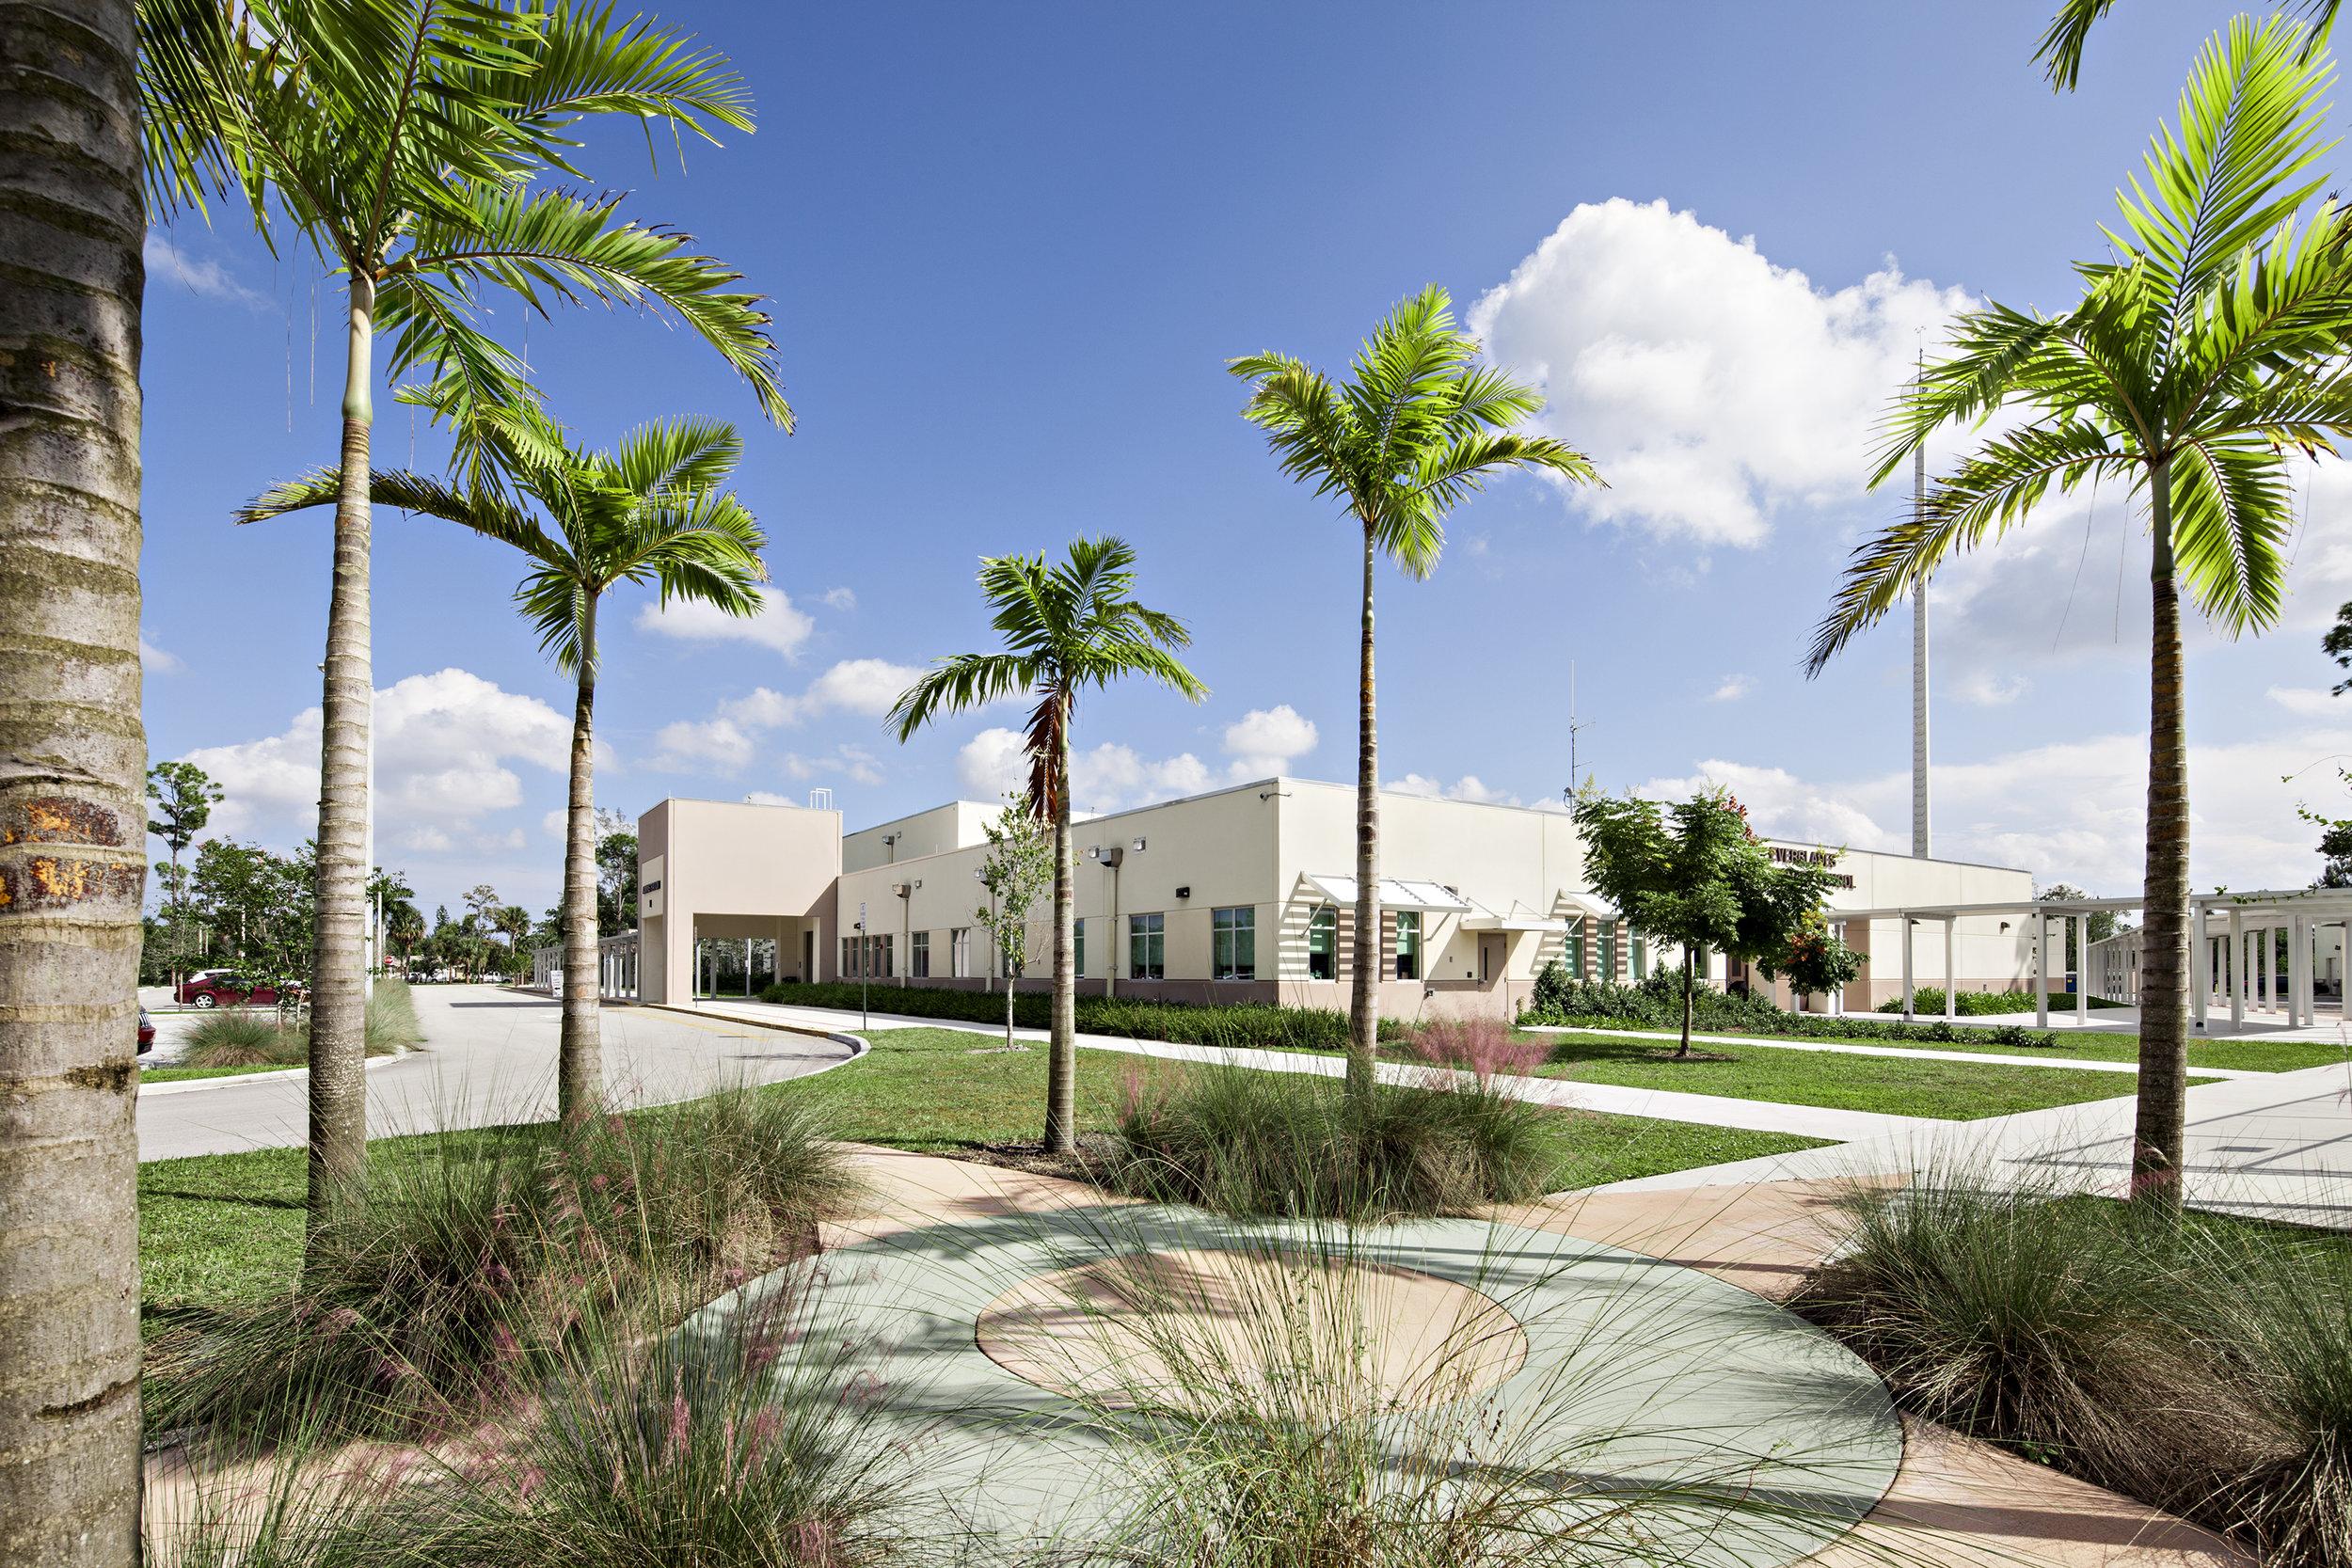 Everglades Elementary School -